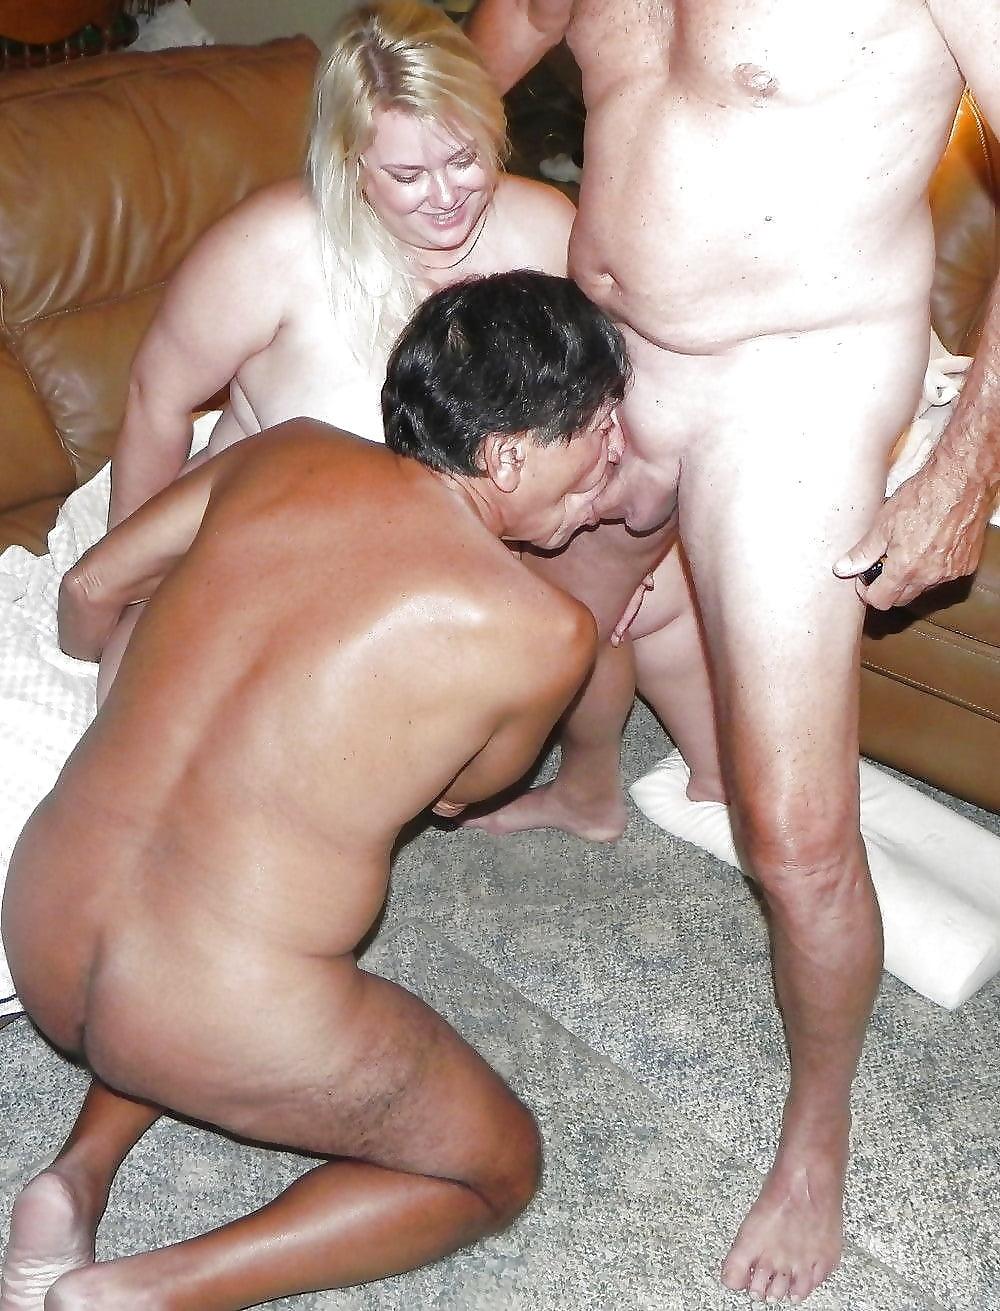 Секс бисексуалов-домашнее фото — 8